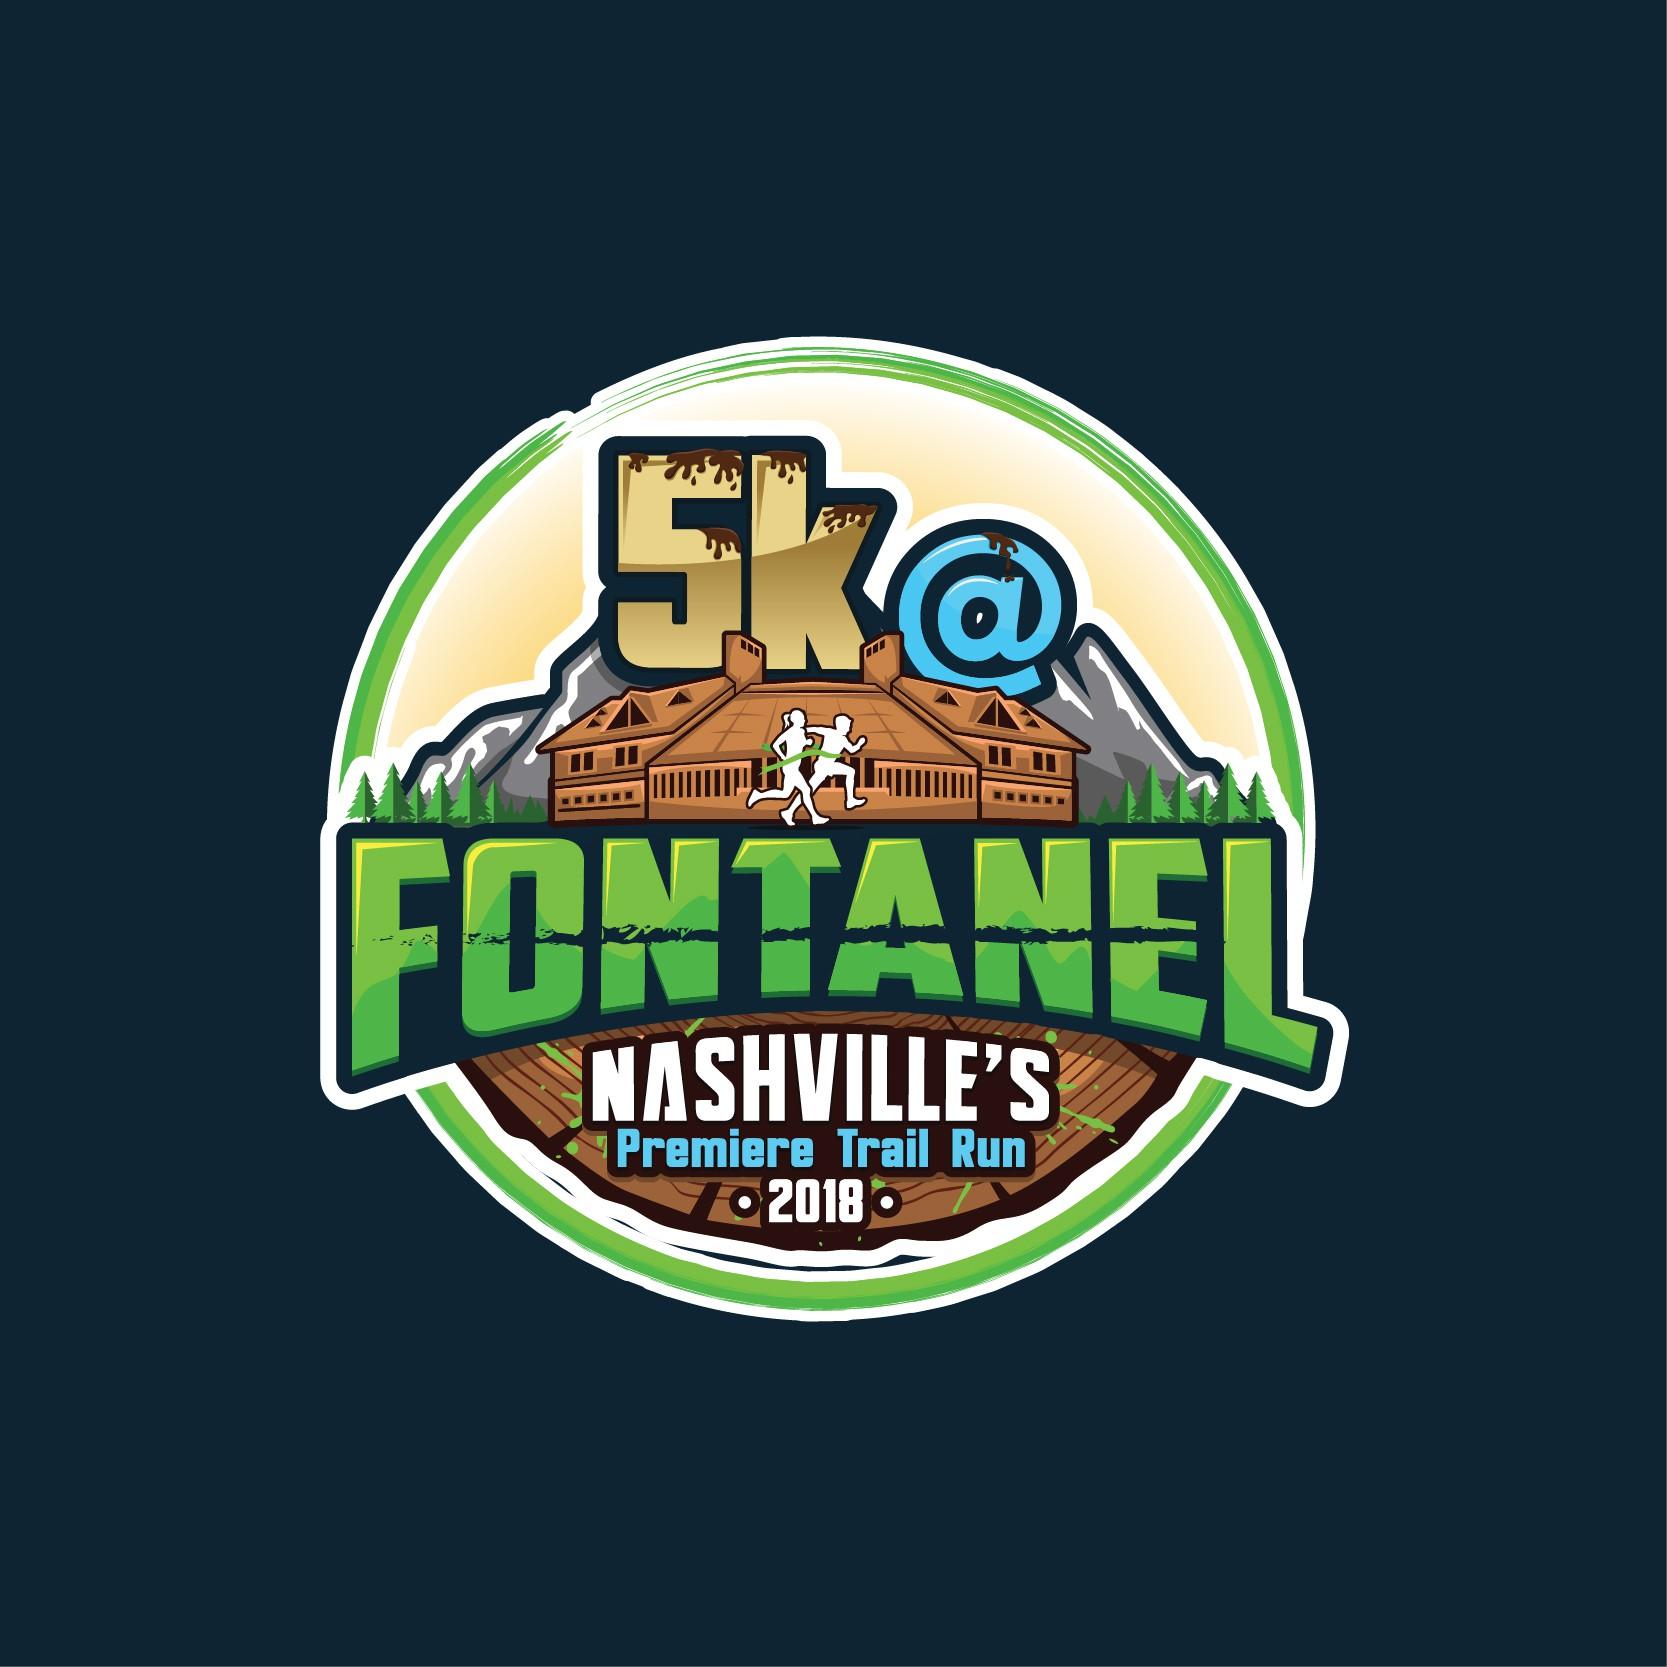 Nashville's Premiere Trail Run needs powerful logo